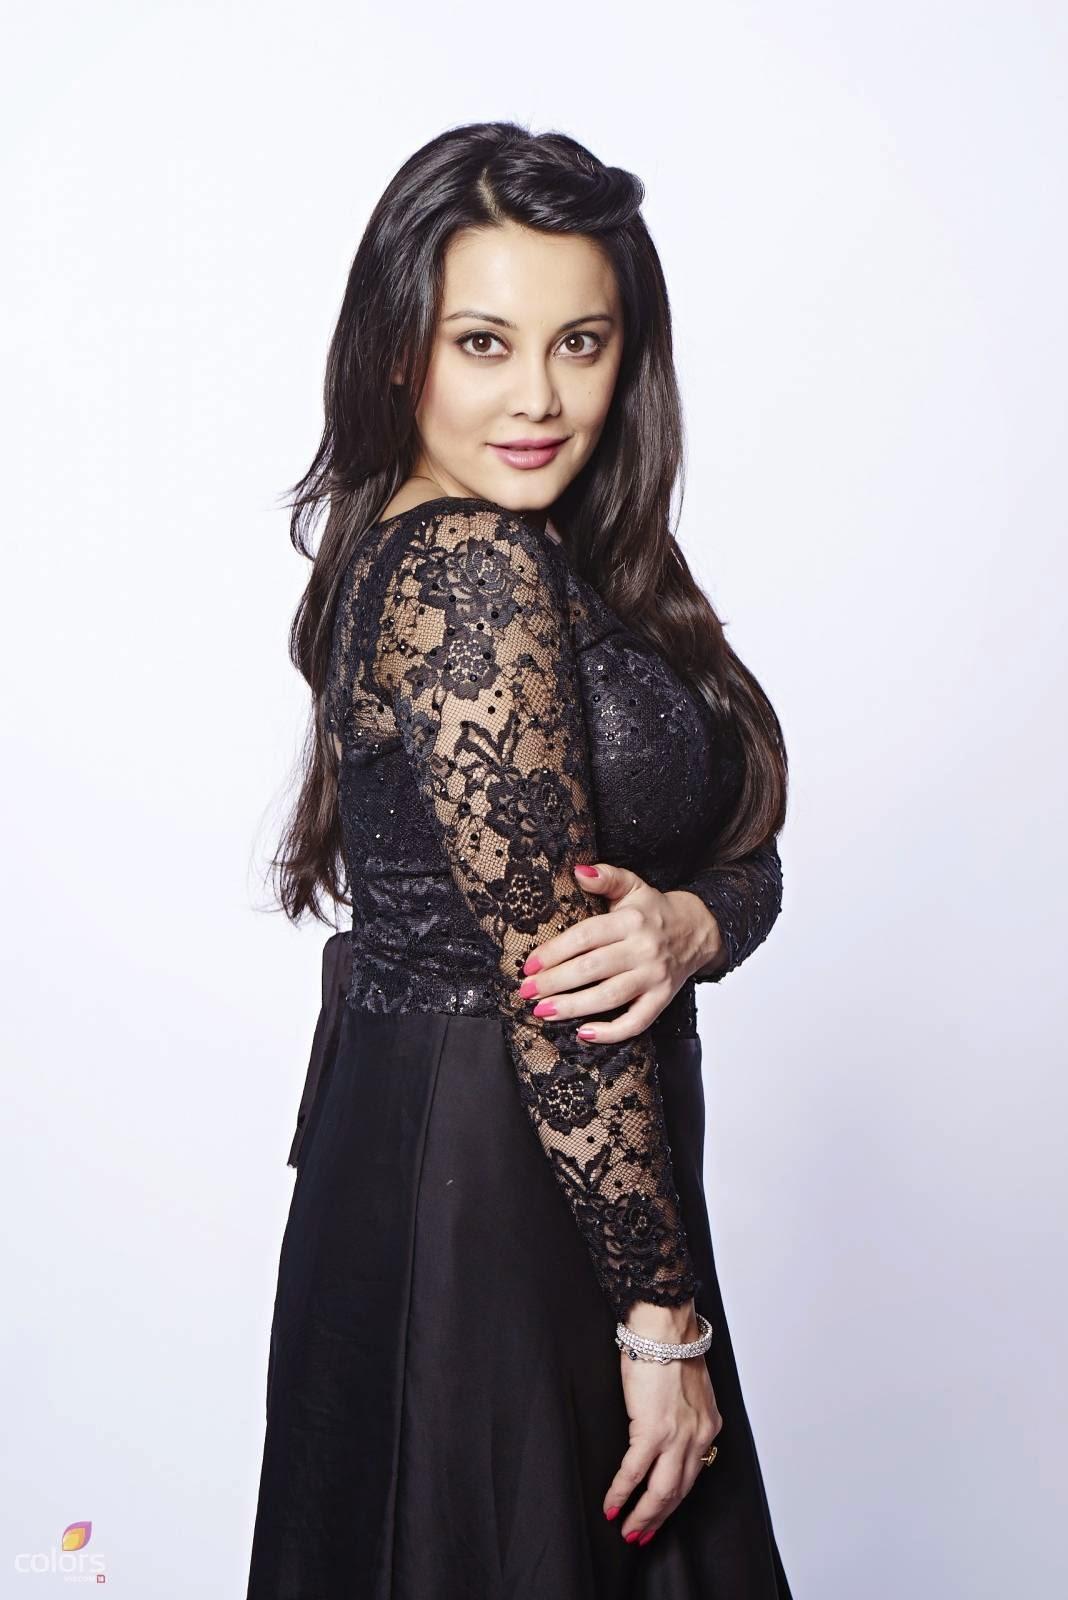 Minissha Lamba, Bigg Boss 8 Contestants Pics, Wiki & Biography